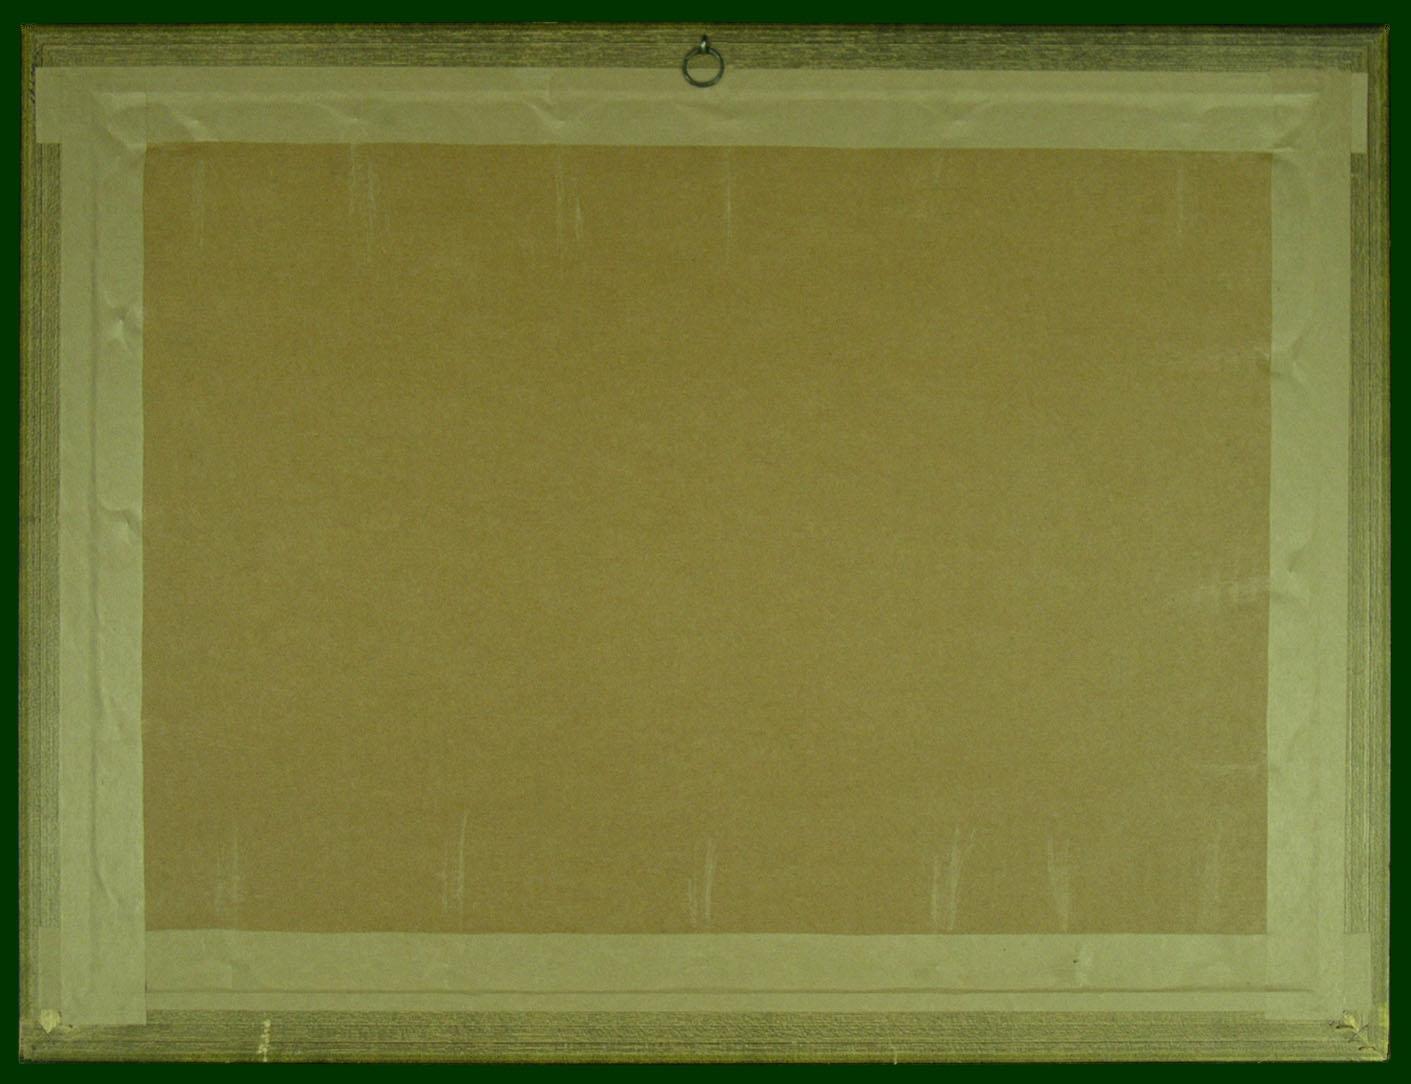 67-8hat.JPG (1411×1084)